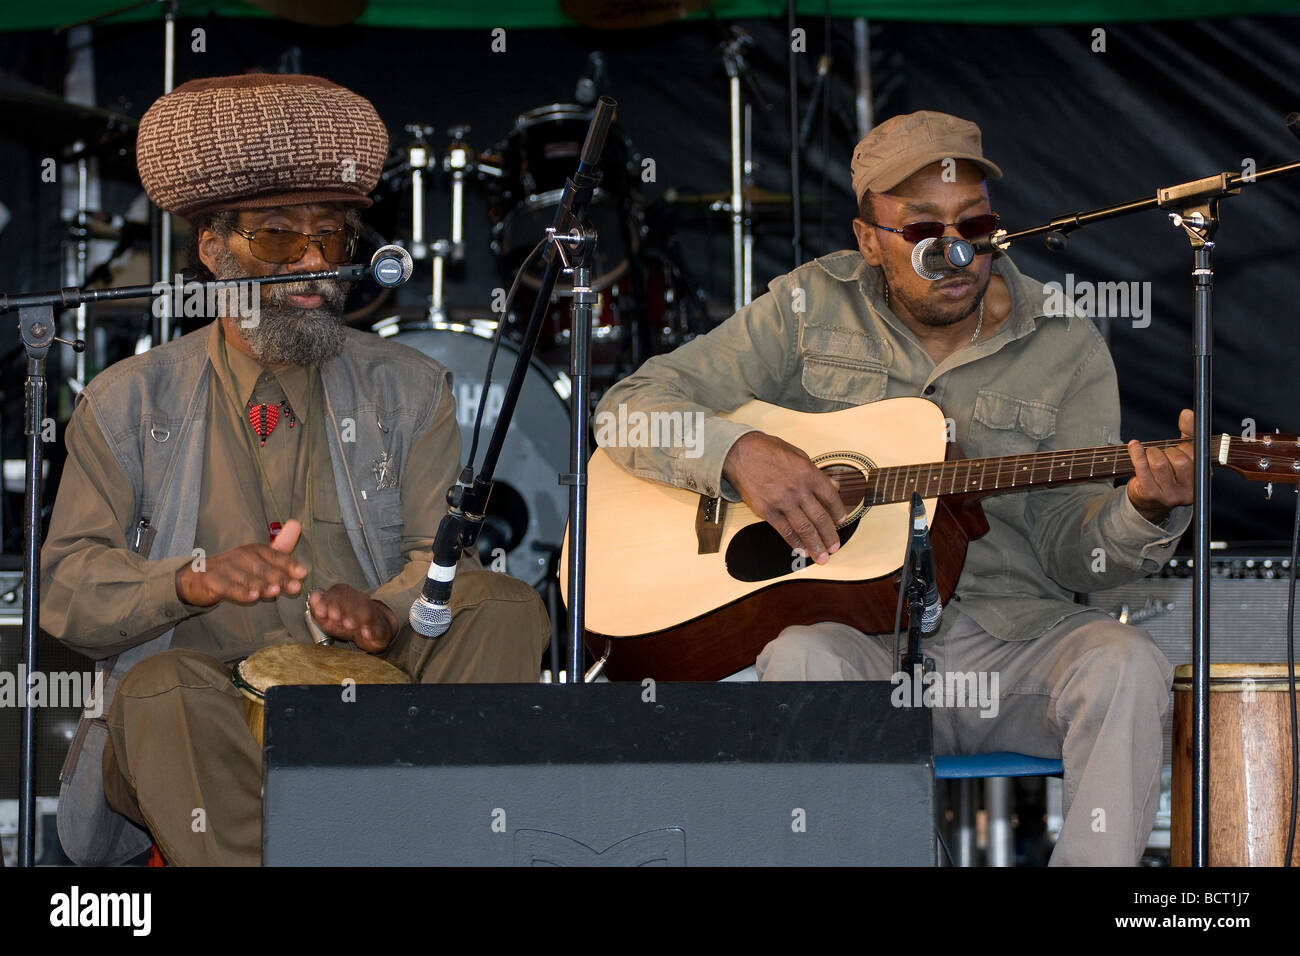 guitarist black ethnic lead singer reggae band  Lambeth Country Show, Brockwell Park, Tulse Hill, London, England, - Stock Image